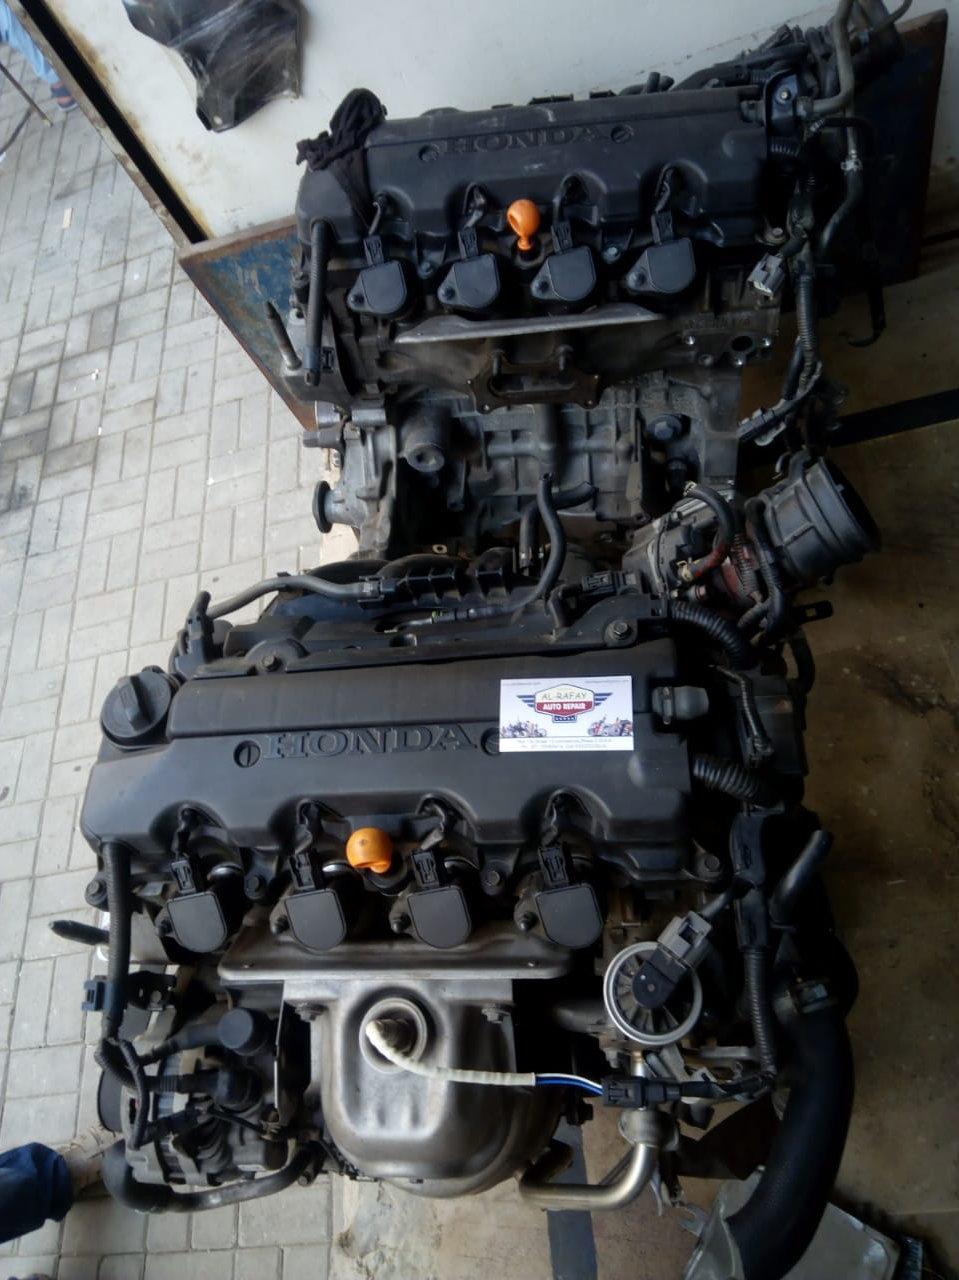 Honda Civic Engines For Sale >> Used Reborn Honda Civic Engine